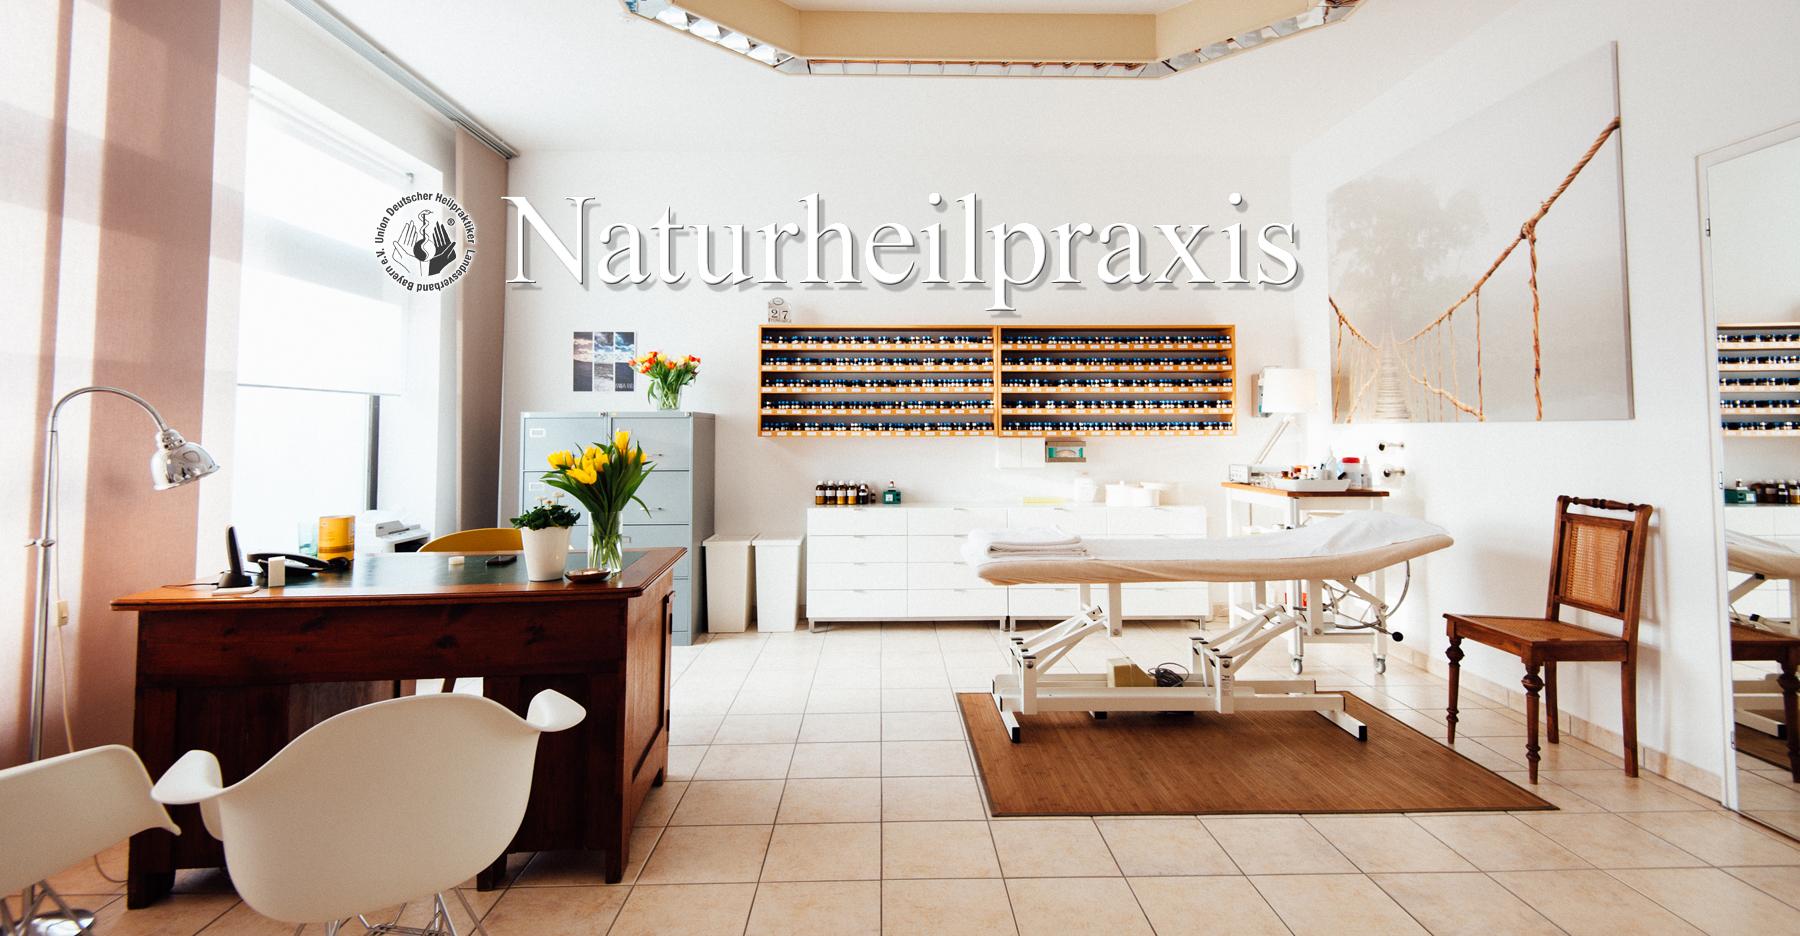 Naturheilpraxis_Pattberg_Herrsching_breit2